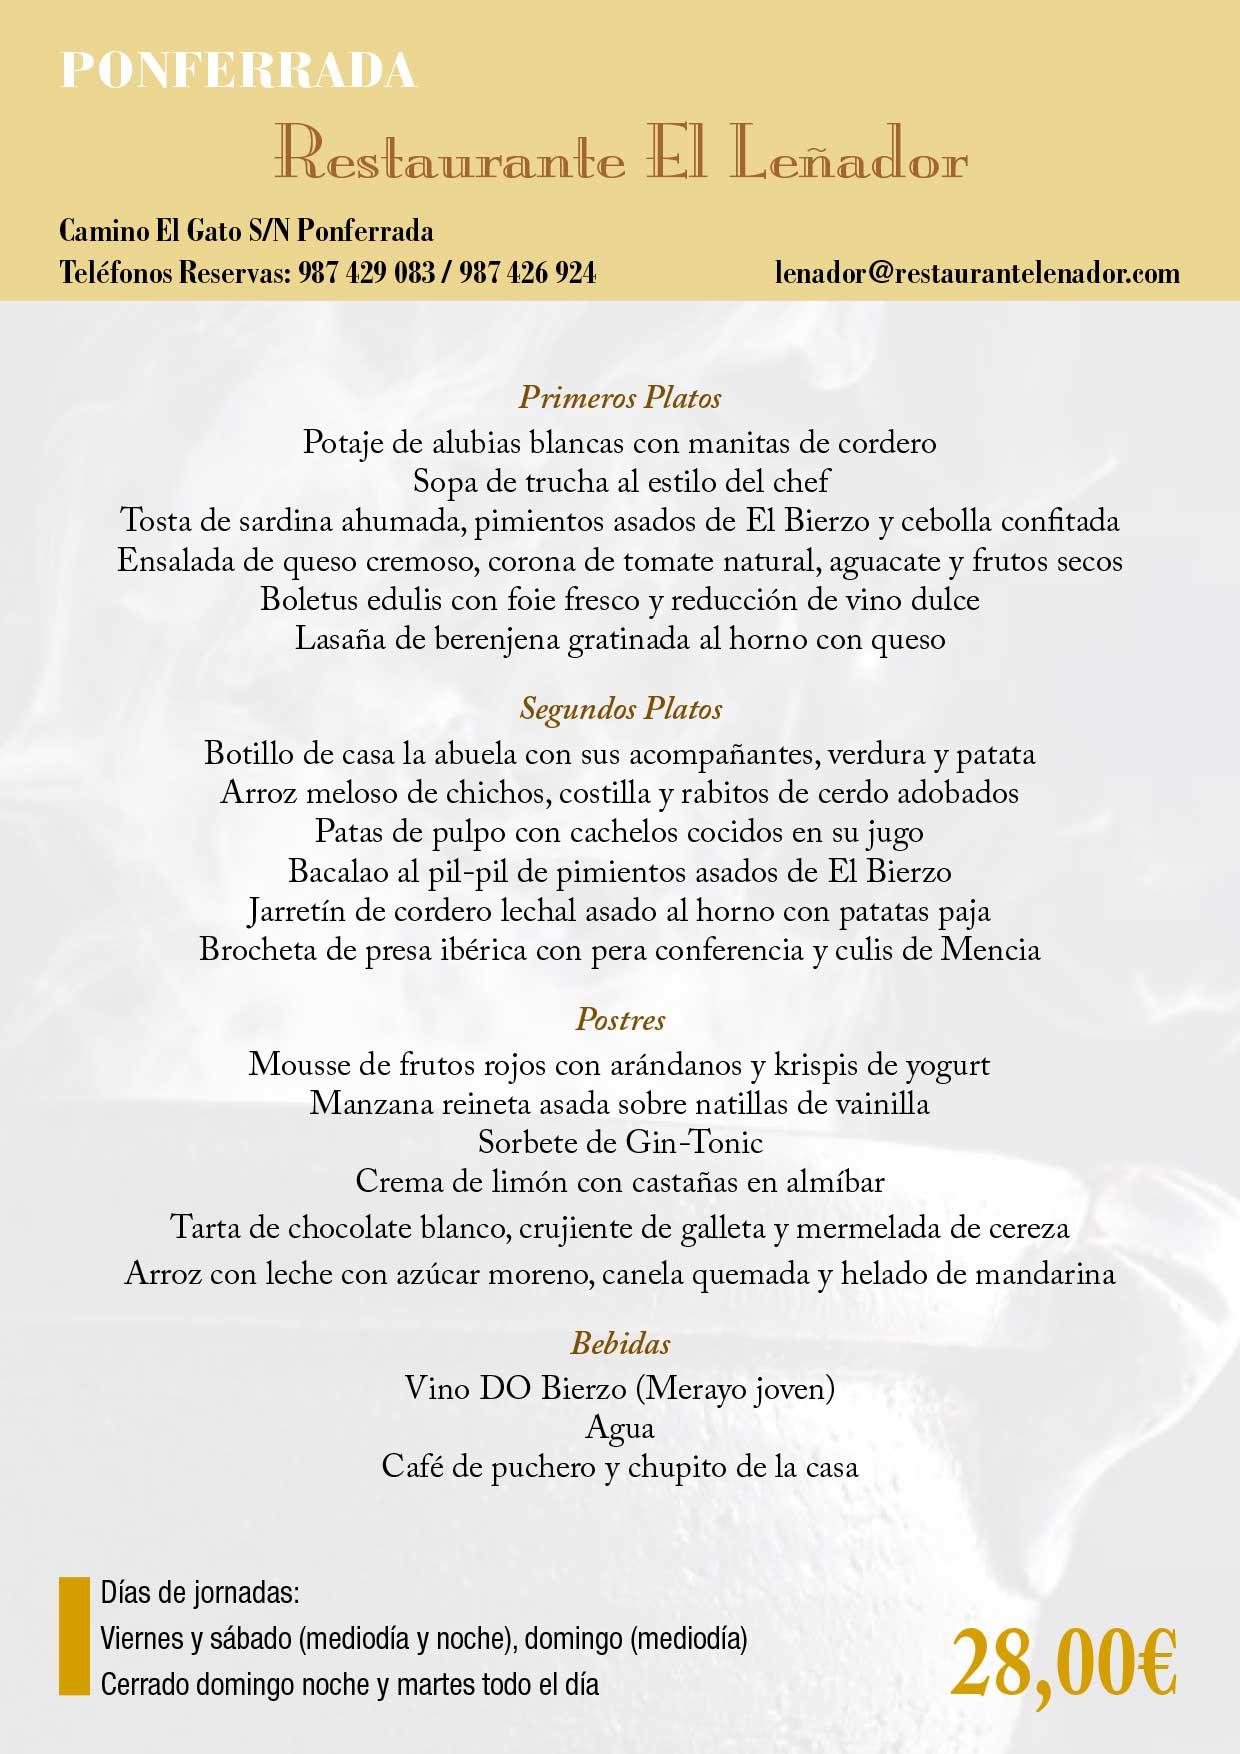 XXXIII Jornadas gastronómicas del Bierzo 2017. Restaurantes participantes 31